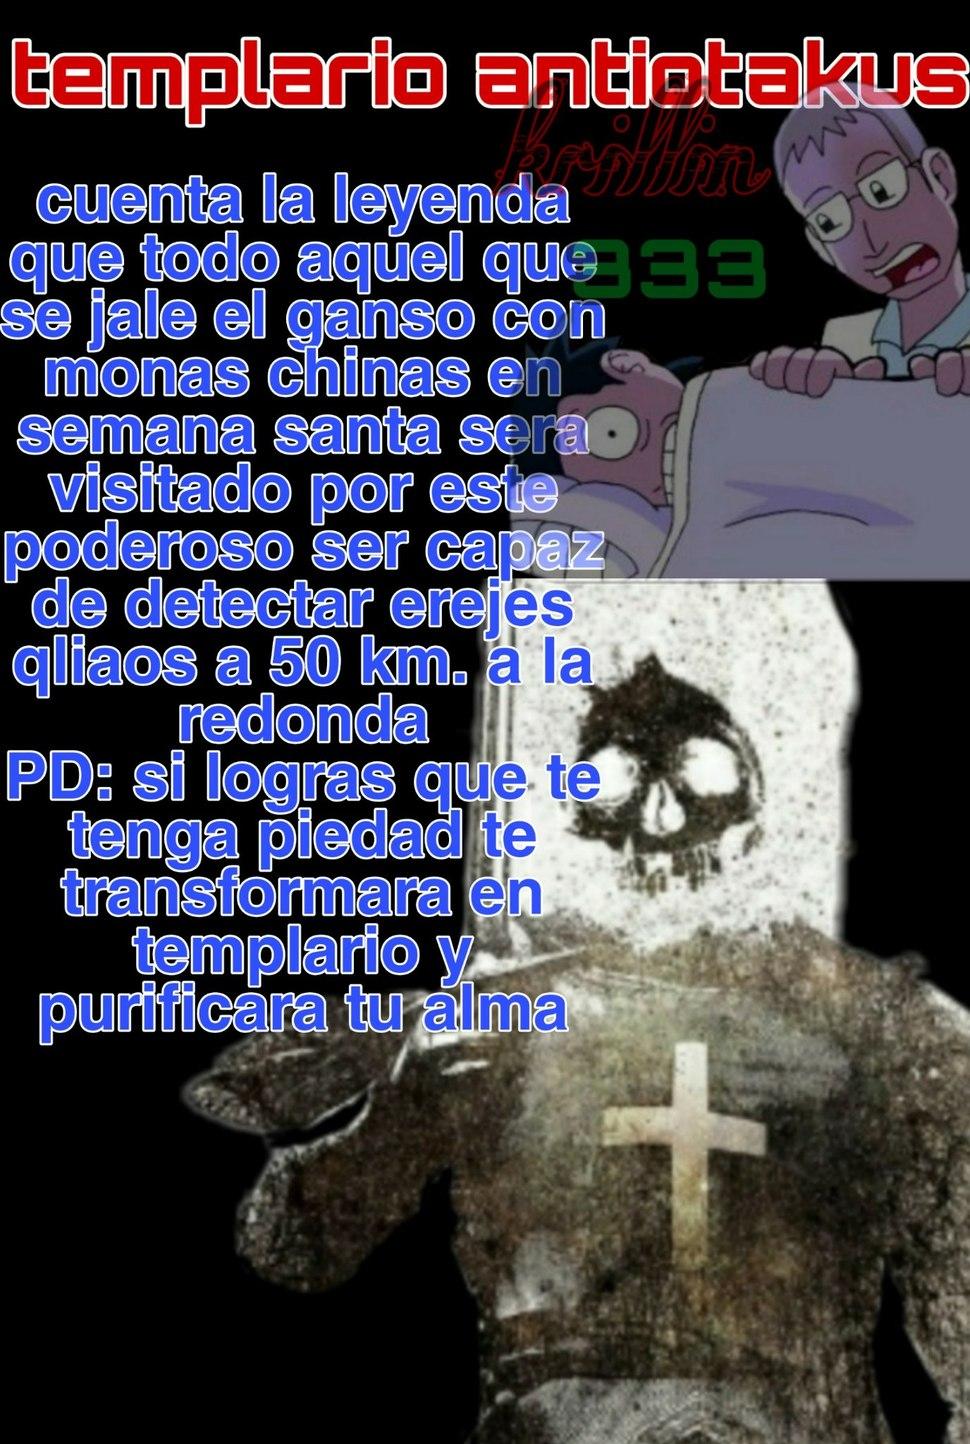 3ra parte - meme